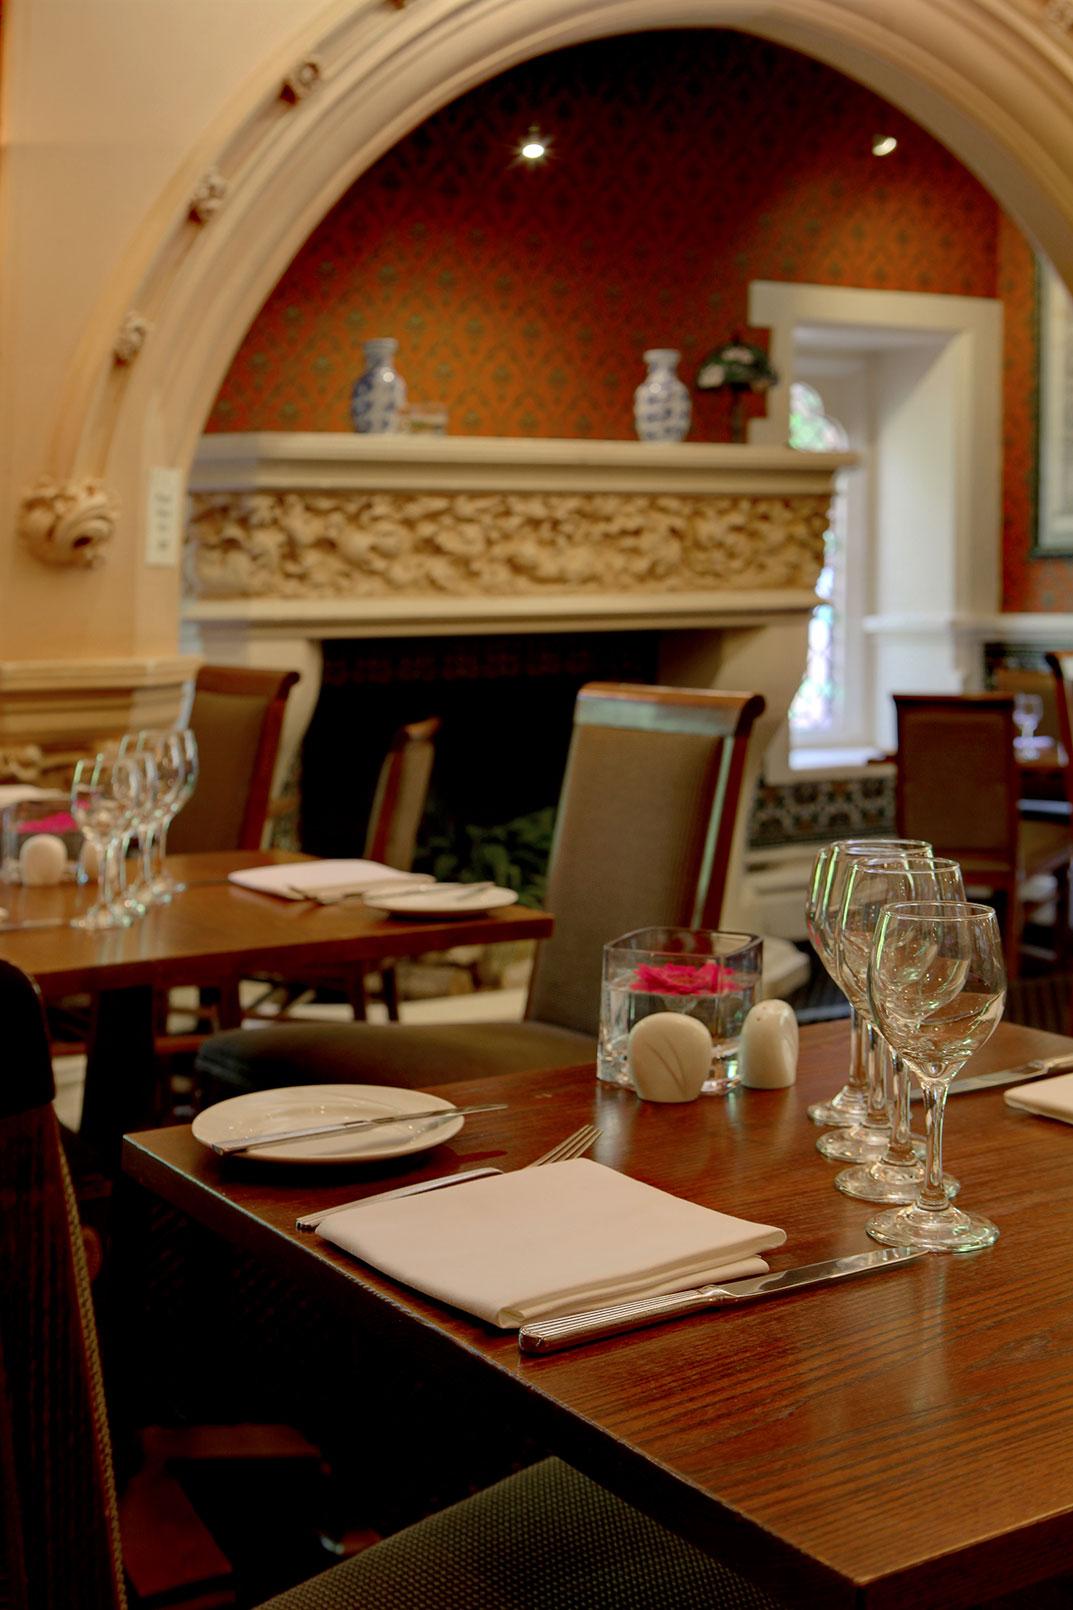 Best Western Hotel Room: Best Western Plus Grims Dyke Hotel